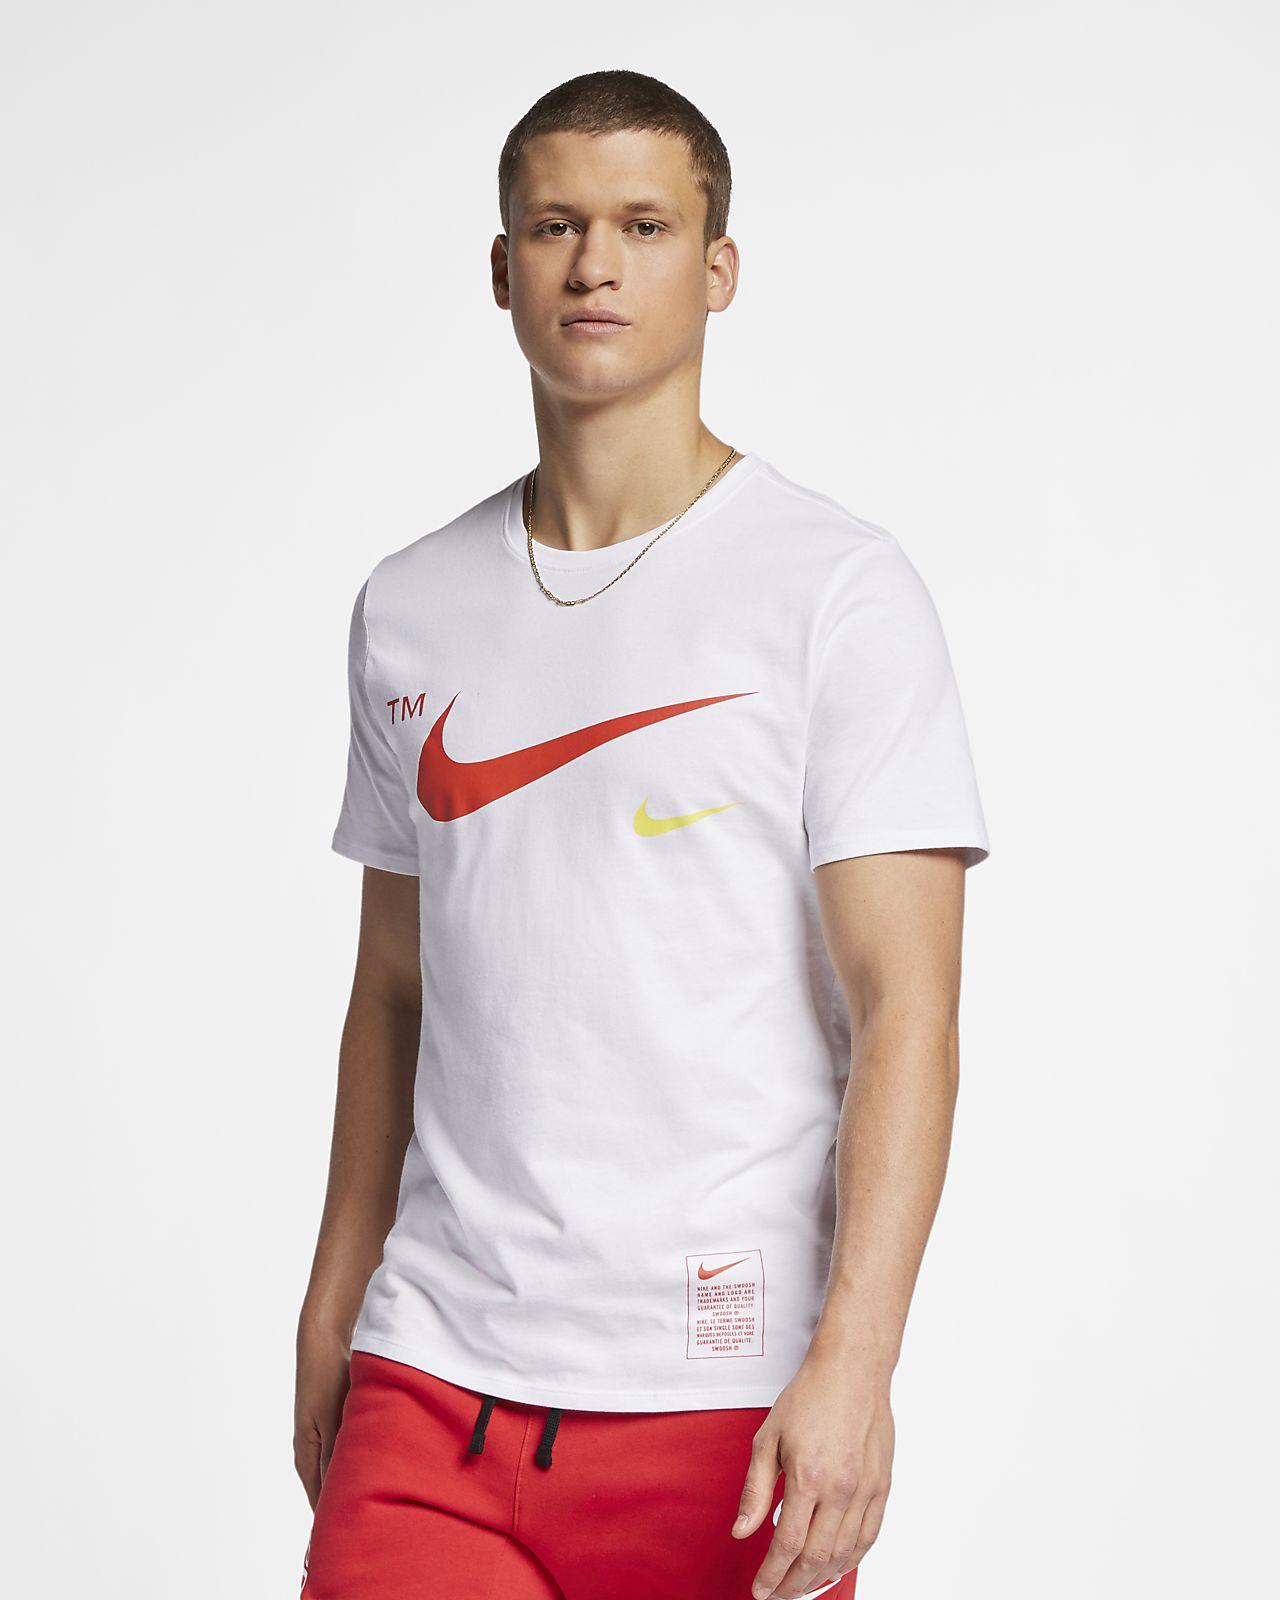 530c3ec69cd12 Playera para hombre nike sportswear jpg 1280x1600 Playera para hombre nike